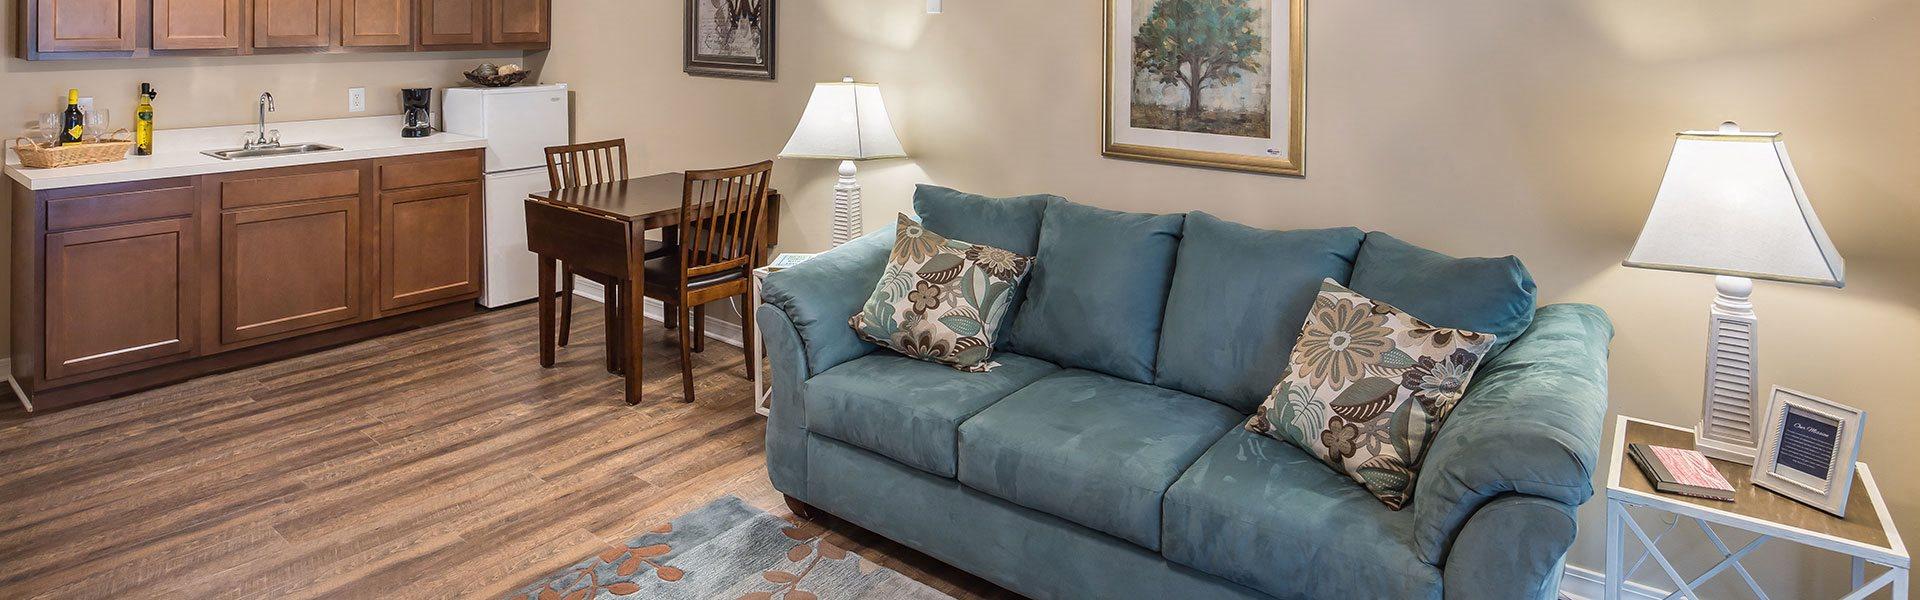 Comfy Sofa at Pacifica Senior Living, Wyndham Lakes, Jacksonville, Florida